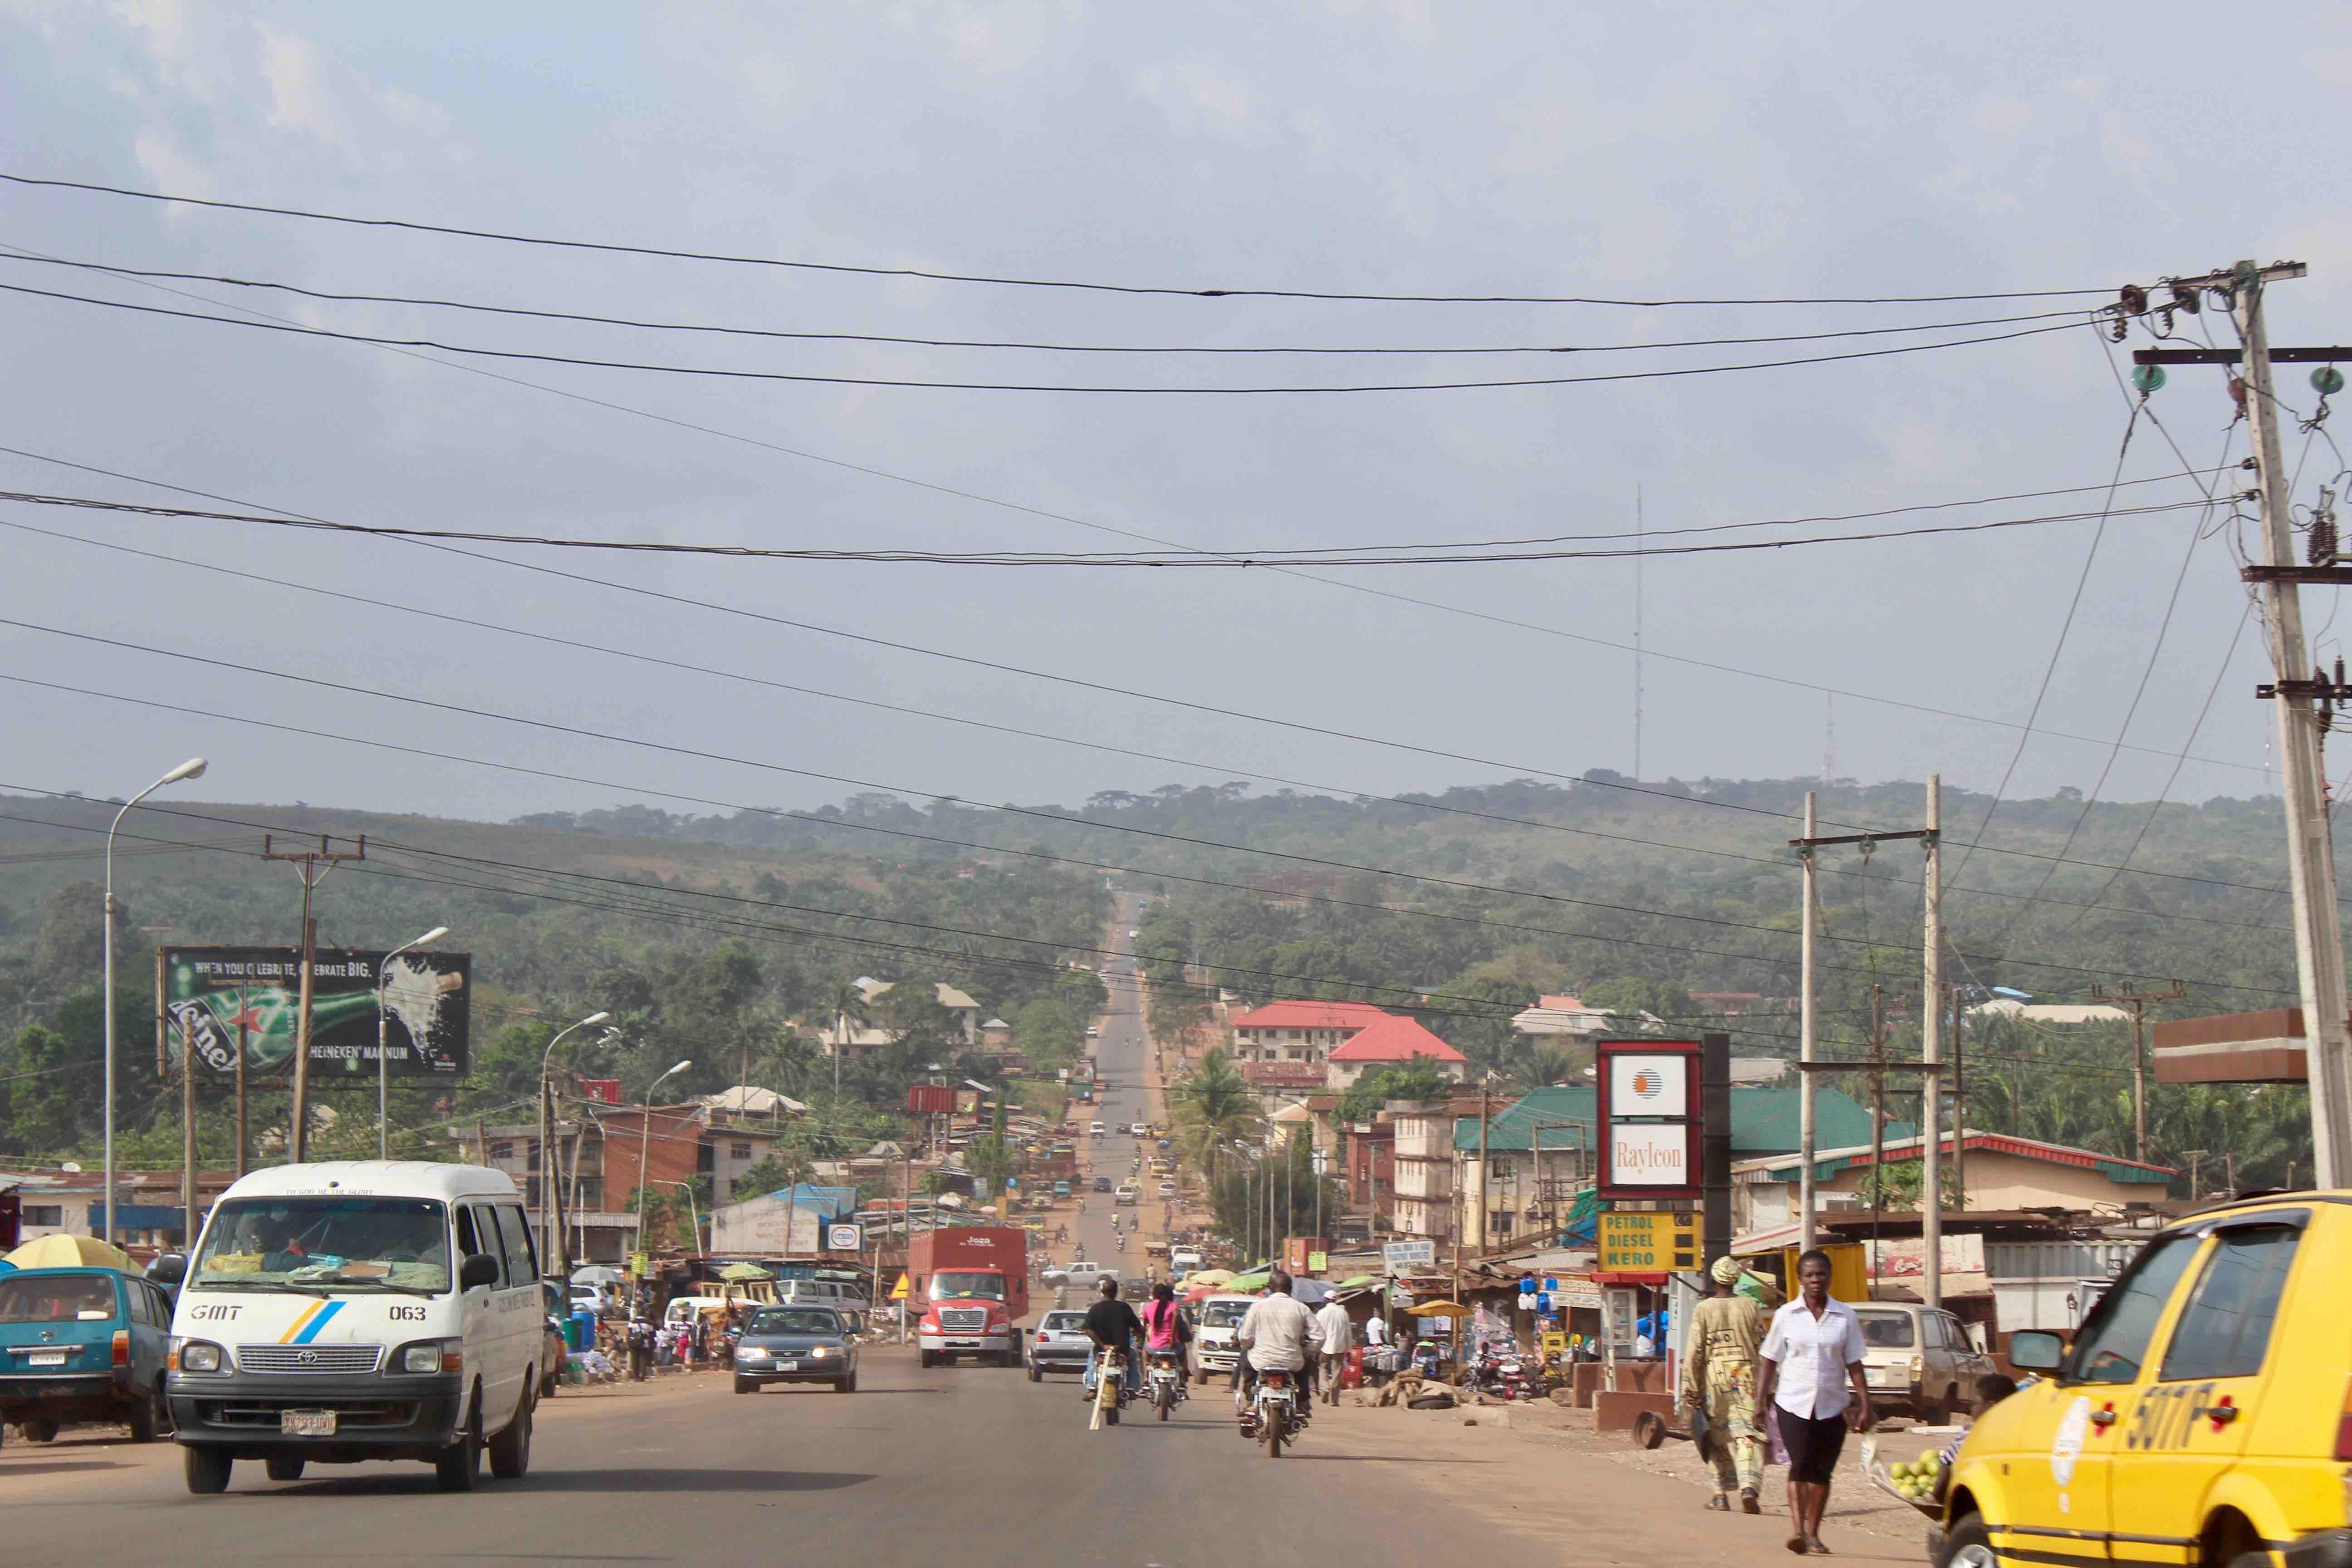 Enugu, Enugu State, Nigeria. #JujuFilms